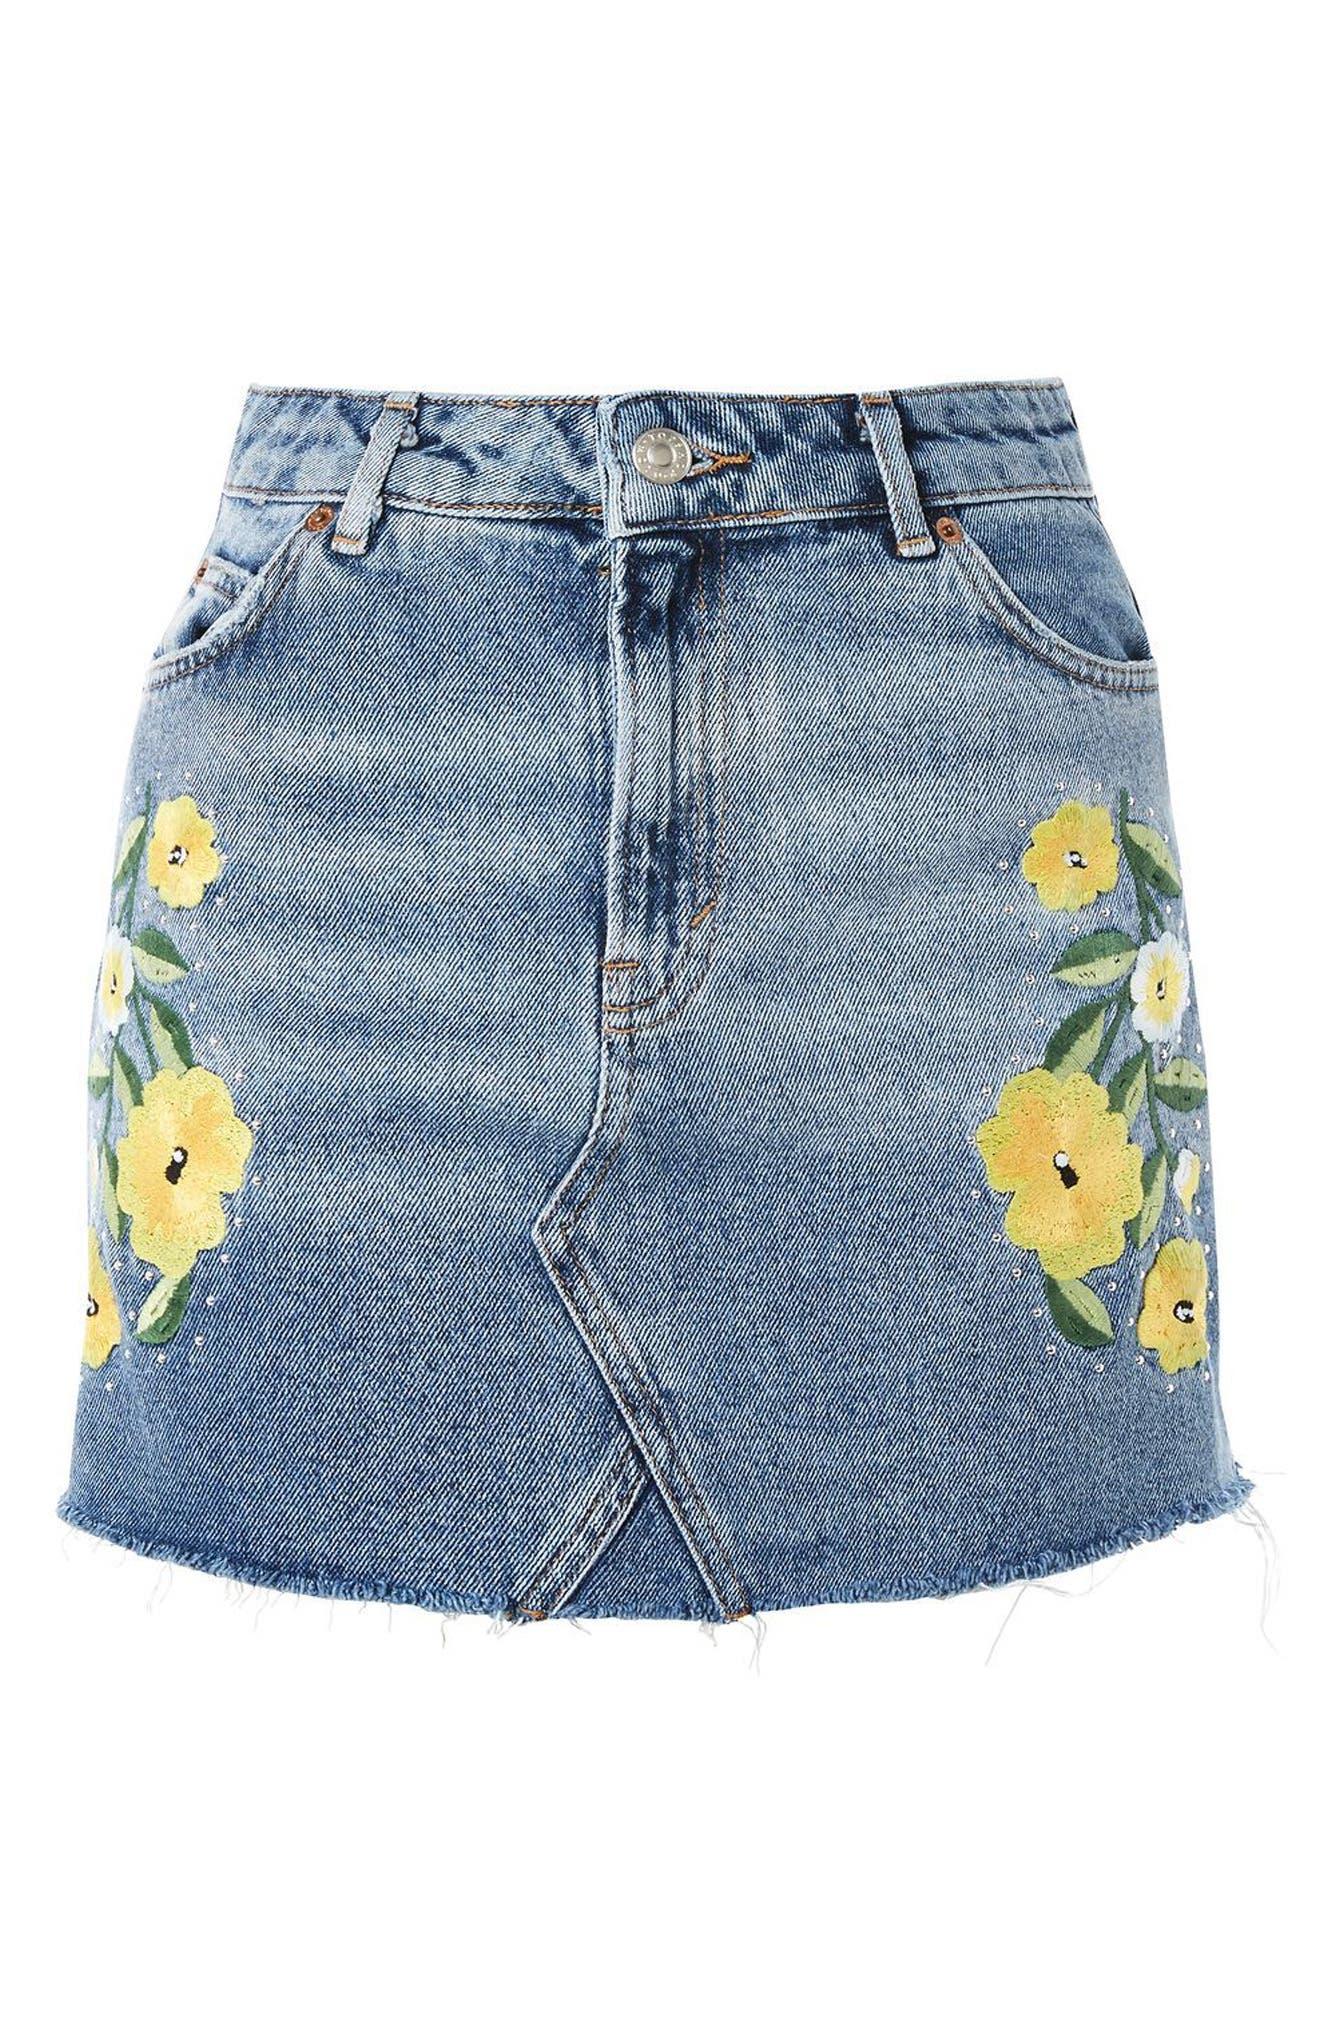 Main Image - Topshop Floral Stud Denim Miniskirt